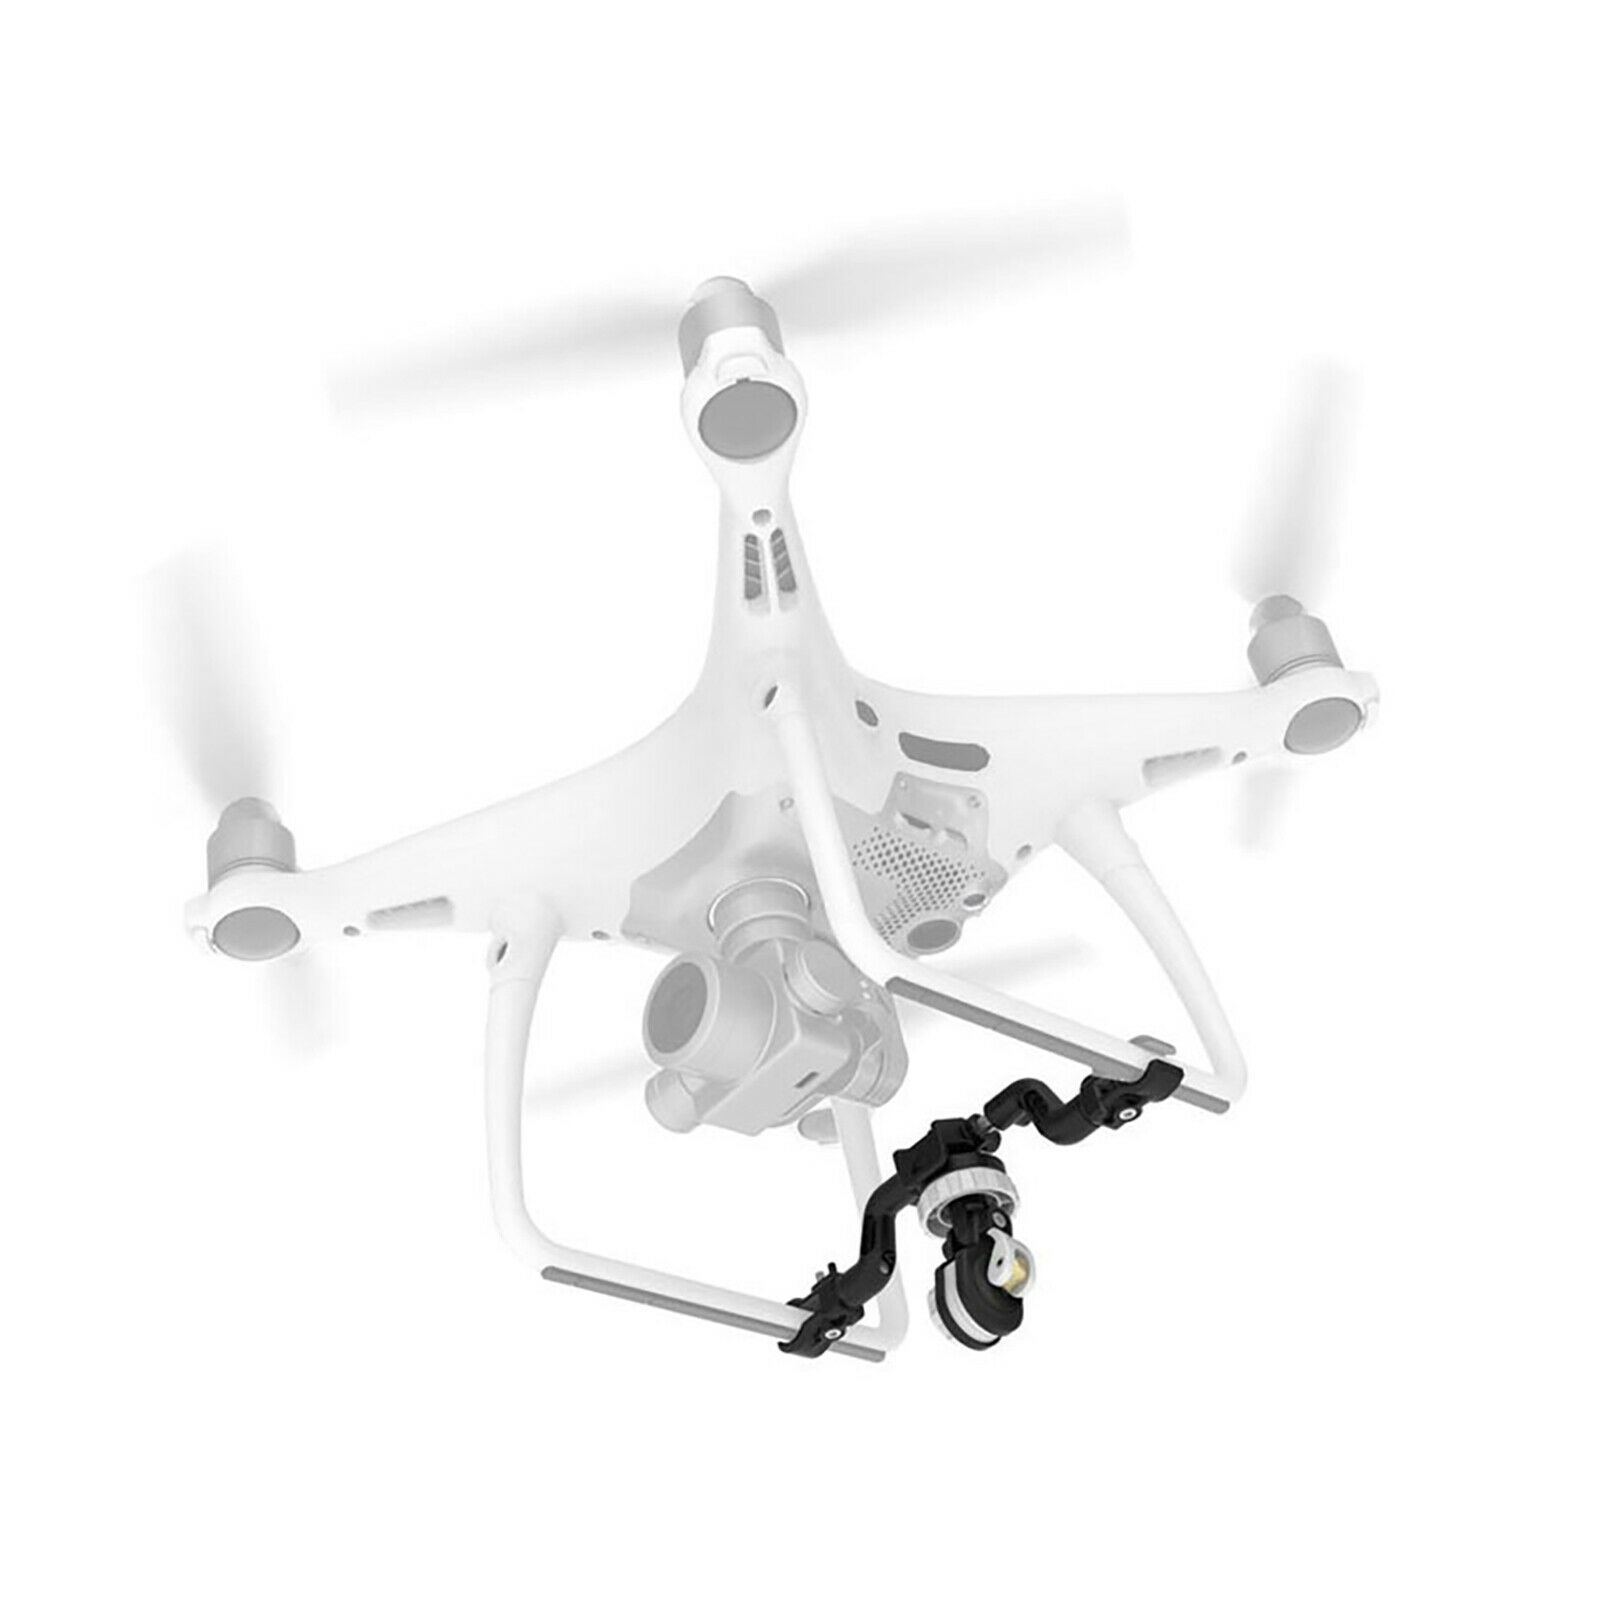 Sea Ulcer Sky Rigger Fishing Rig Equipment for DJI Phantom 1 2 3 4 Drone